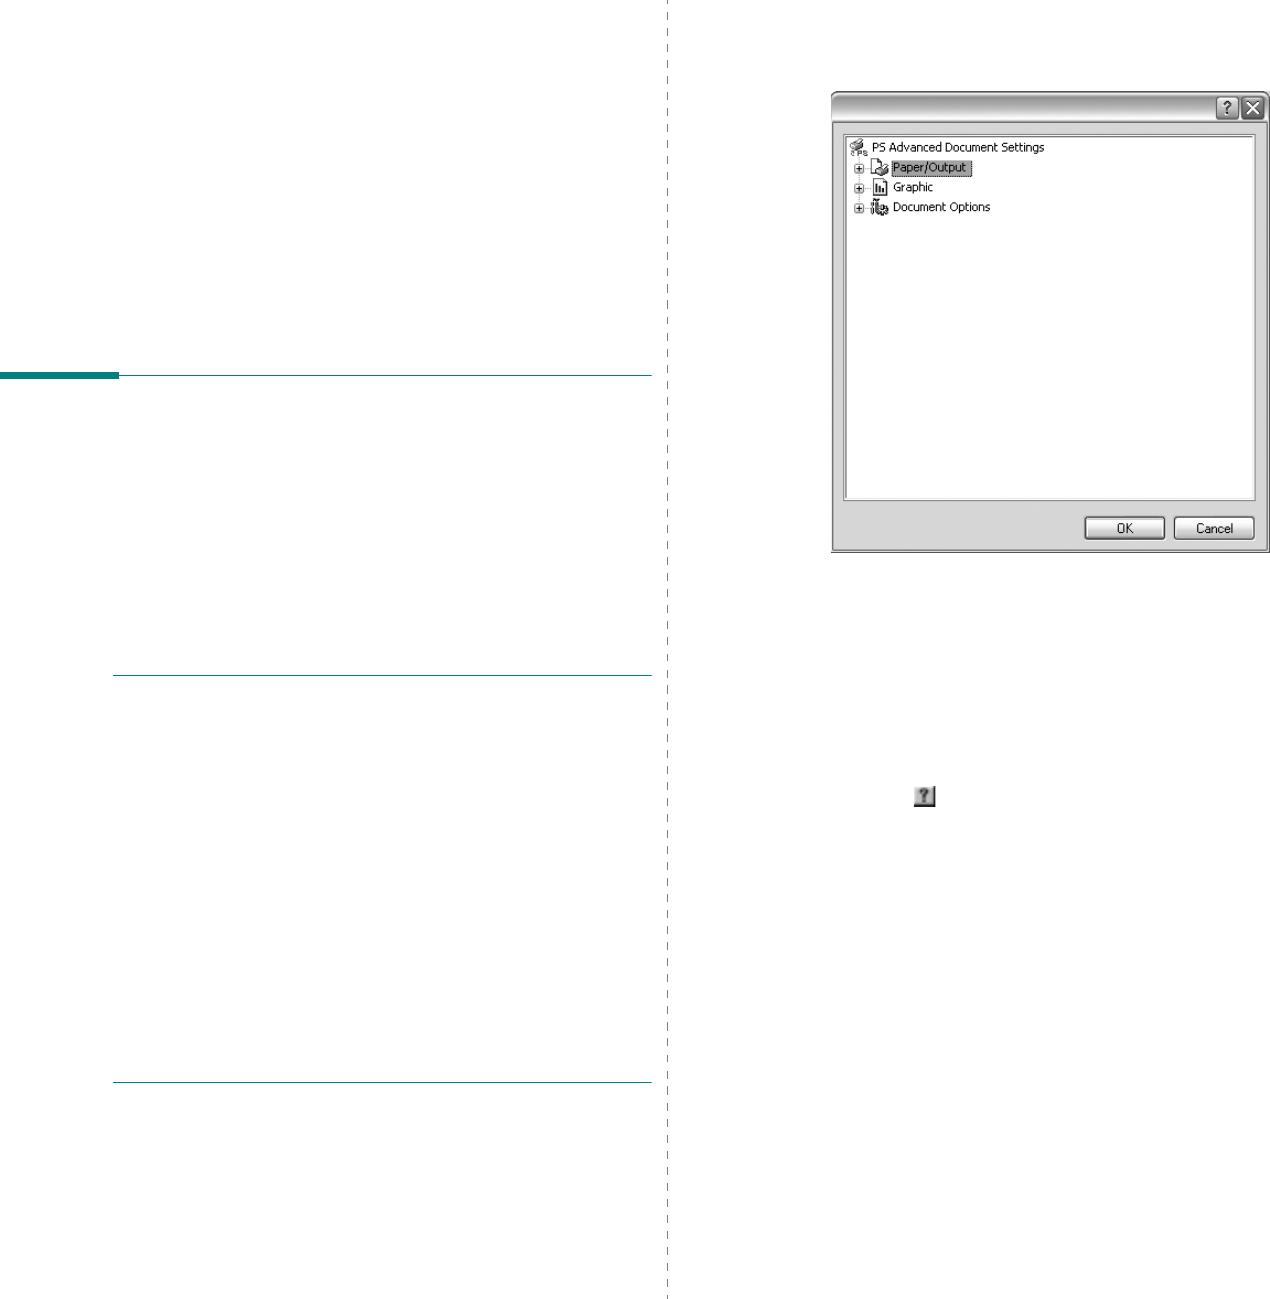 Ricoh Aficio Sp 5100n Users Manual Strap St 3 W Using Windows Postscript Driver